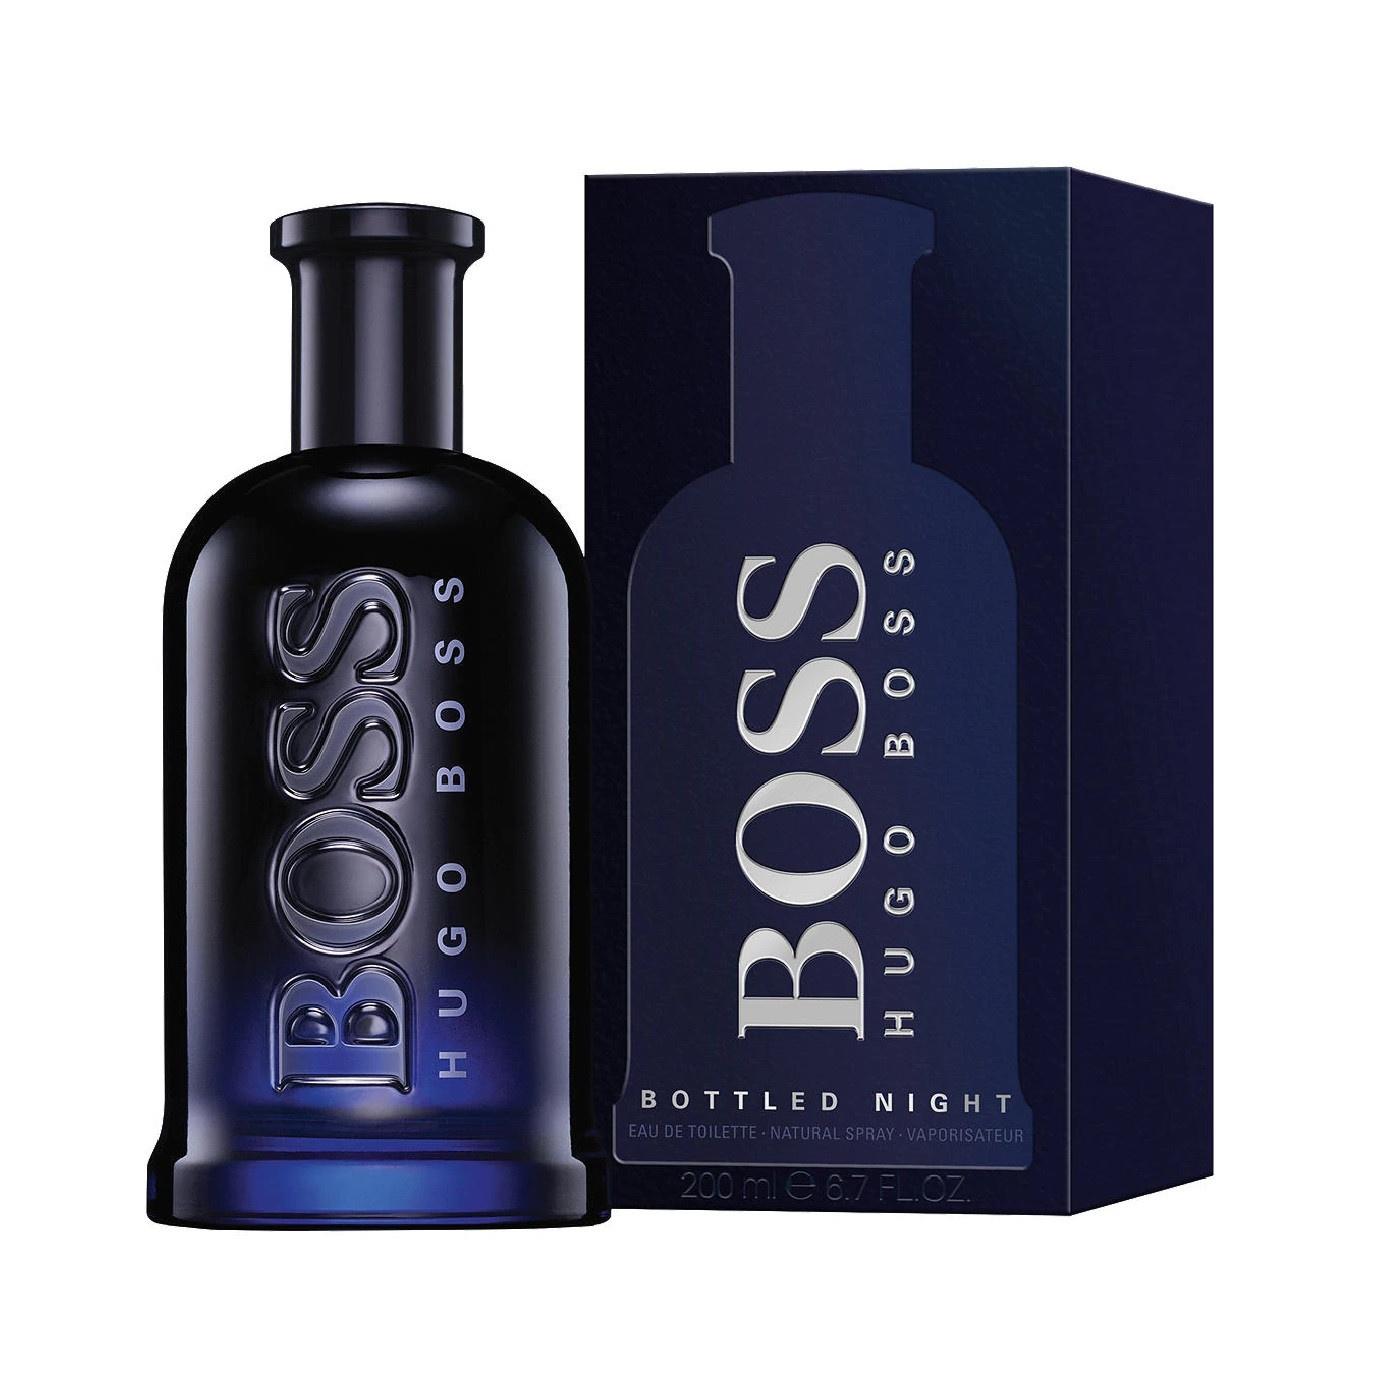 Image of BOSS Hugo Boss Bottled Night - Eau de Toilette - 200 ml